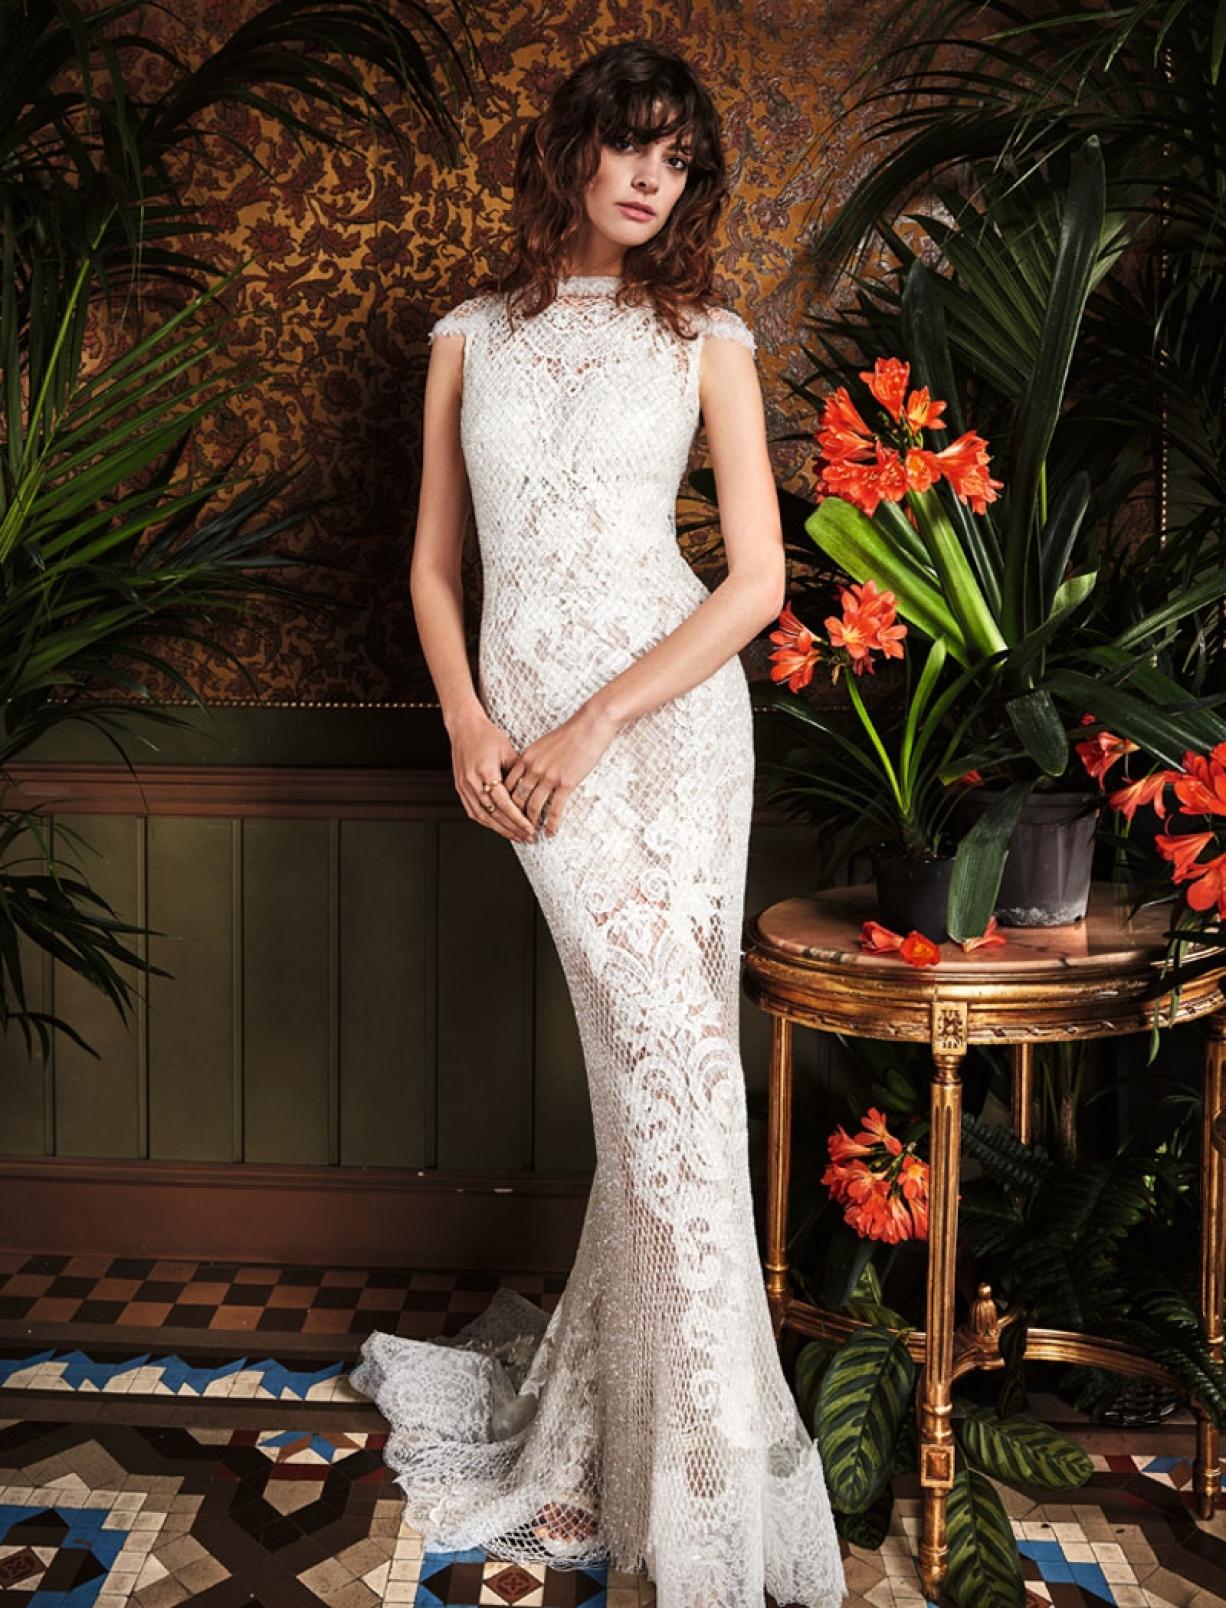 boho_chic_wedding_dresses_2017_bohemian_lace_wedding_dress_yolan_cris_chris_style_mirto.jpg